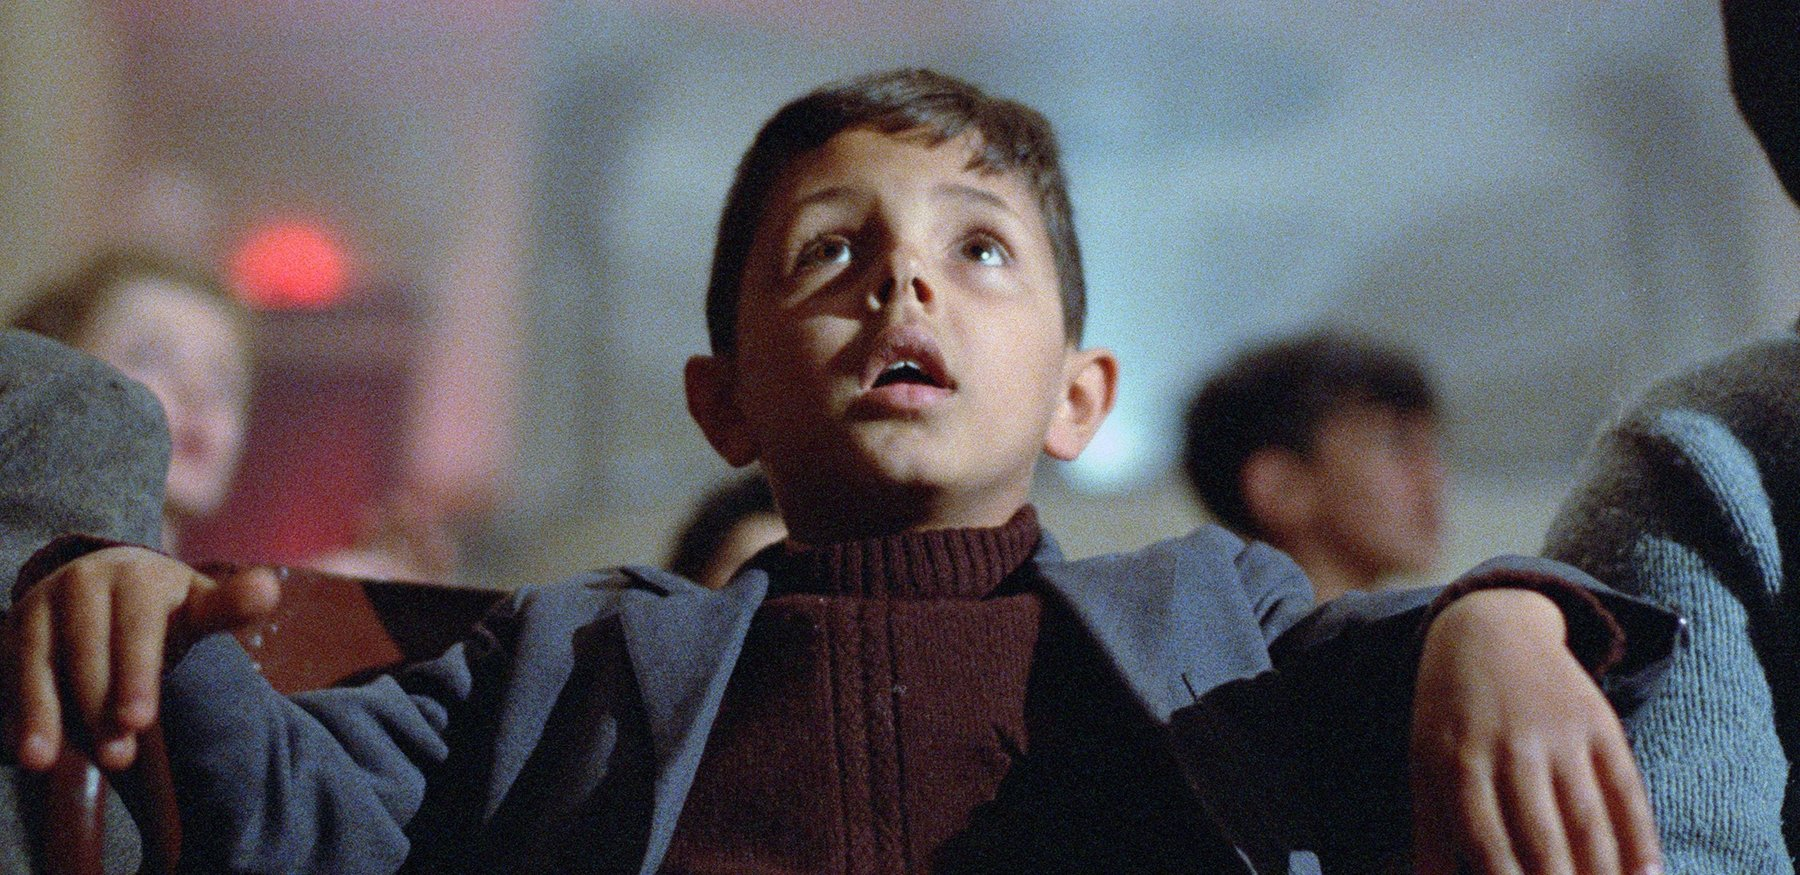 Cinema Paradiso: A film dedicated to films